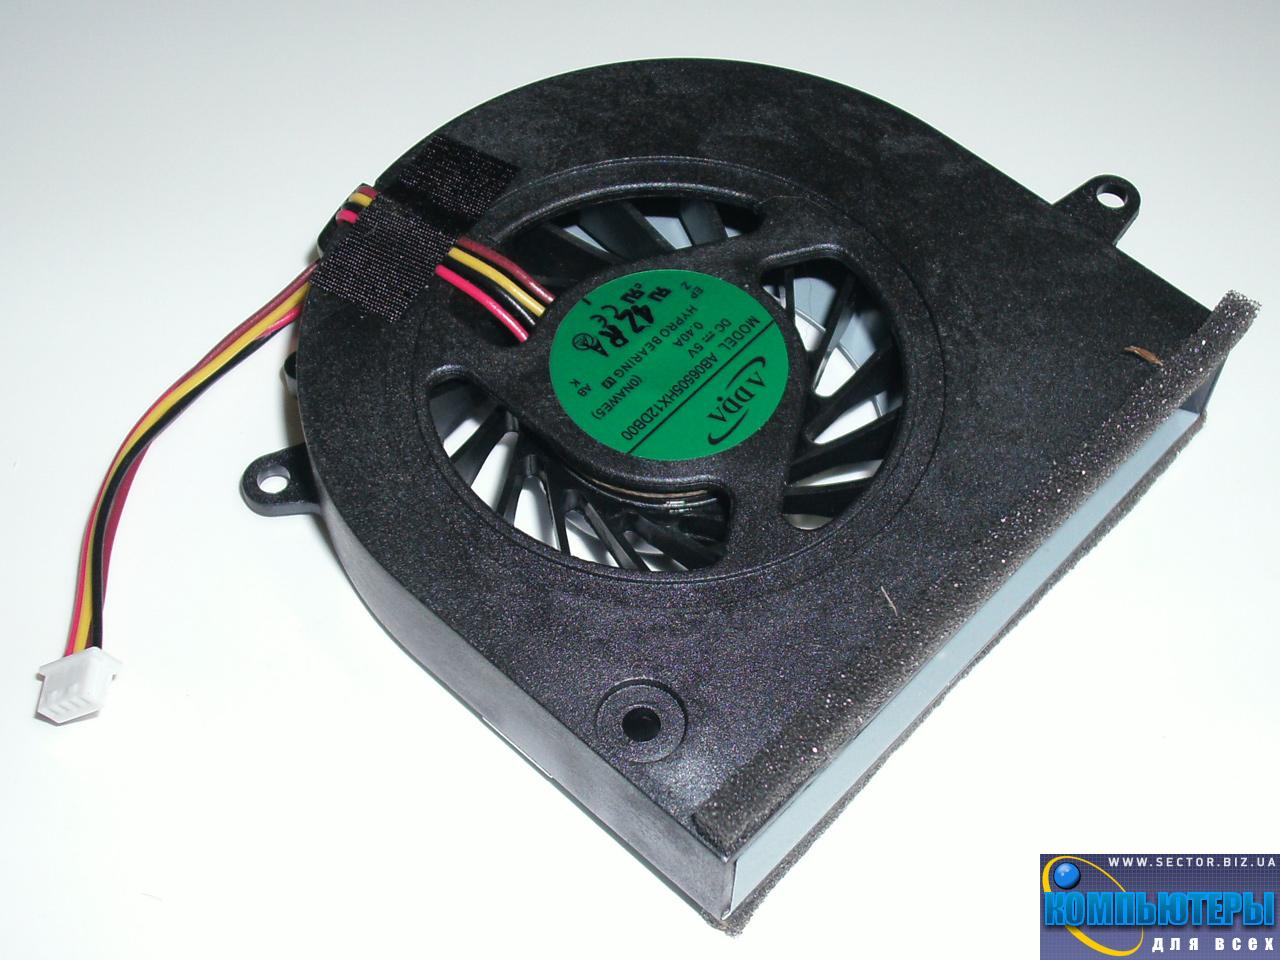 Кулер к ноутбуку Lenovo G460 G460A G560 Z460 Z460A Z465 Z560 Z565 p/n: AB06505HX12DB00. Фото № 2.